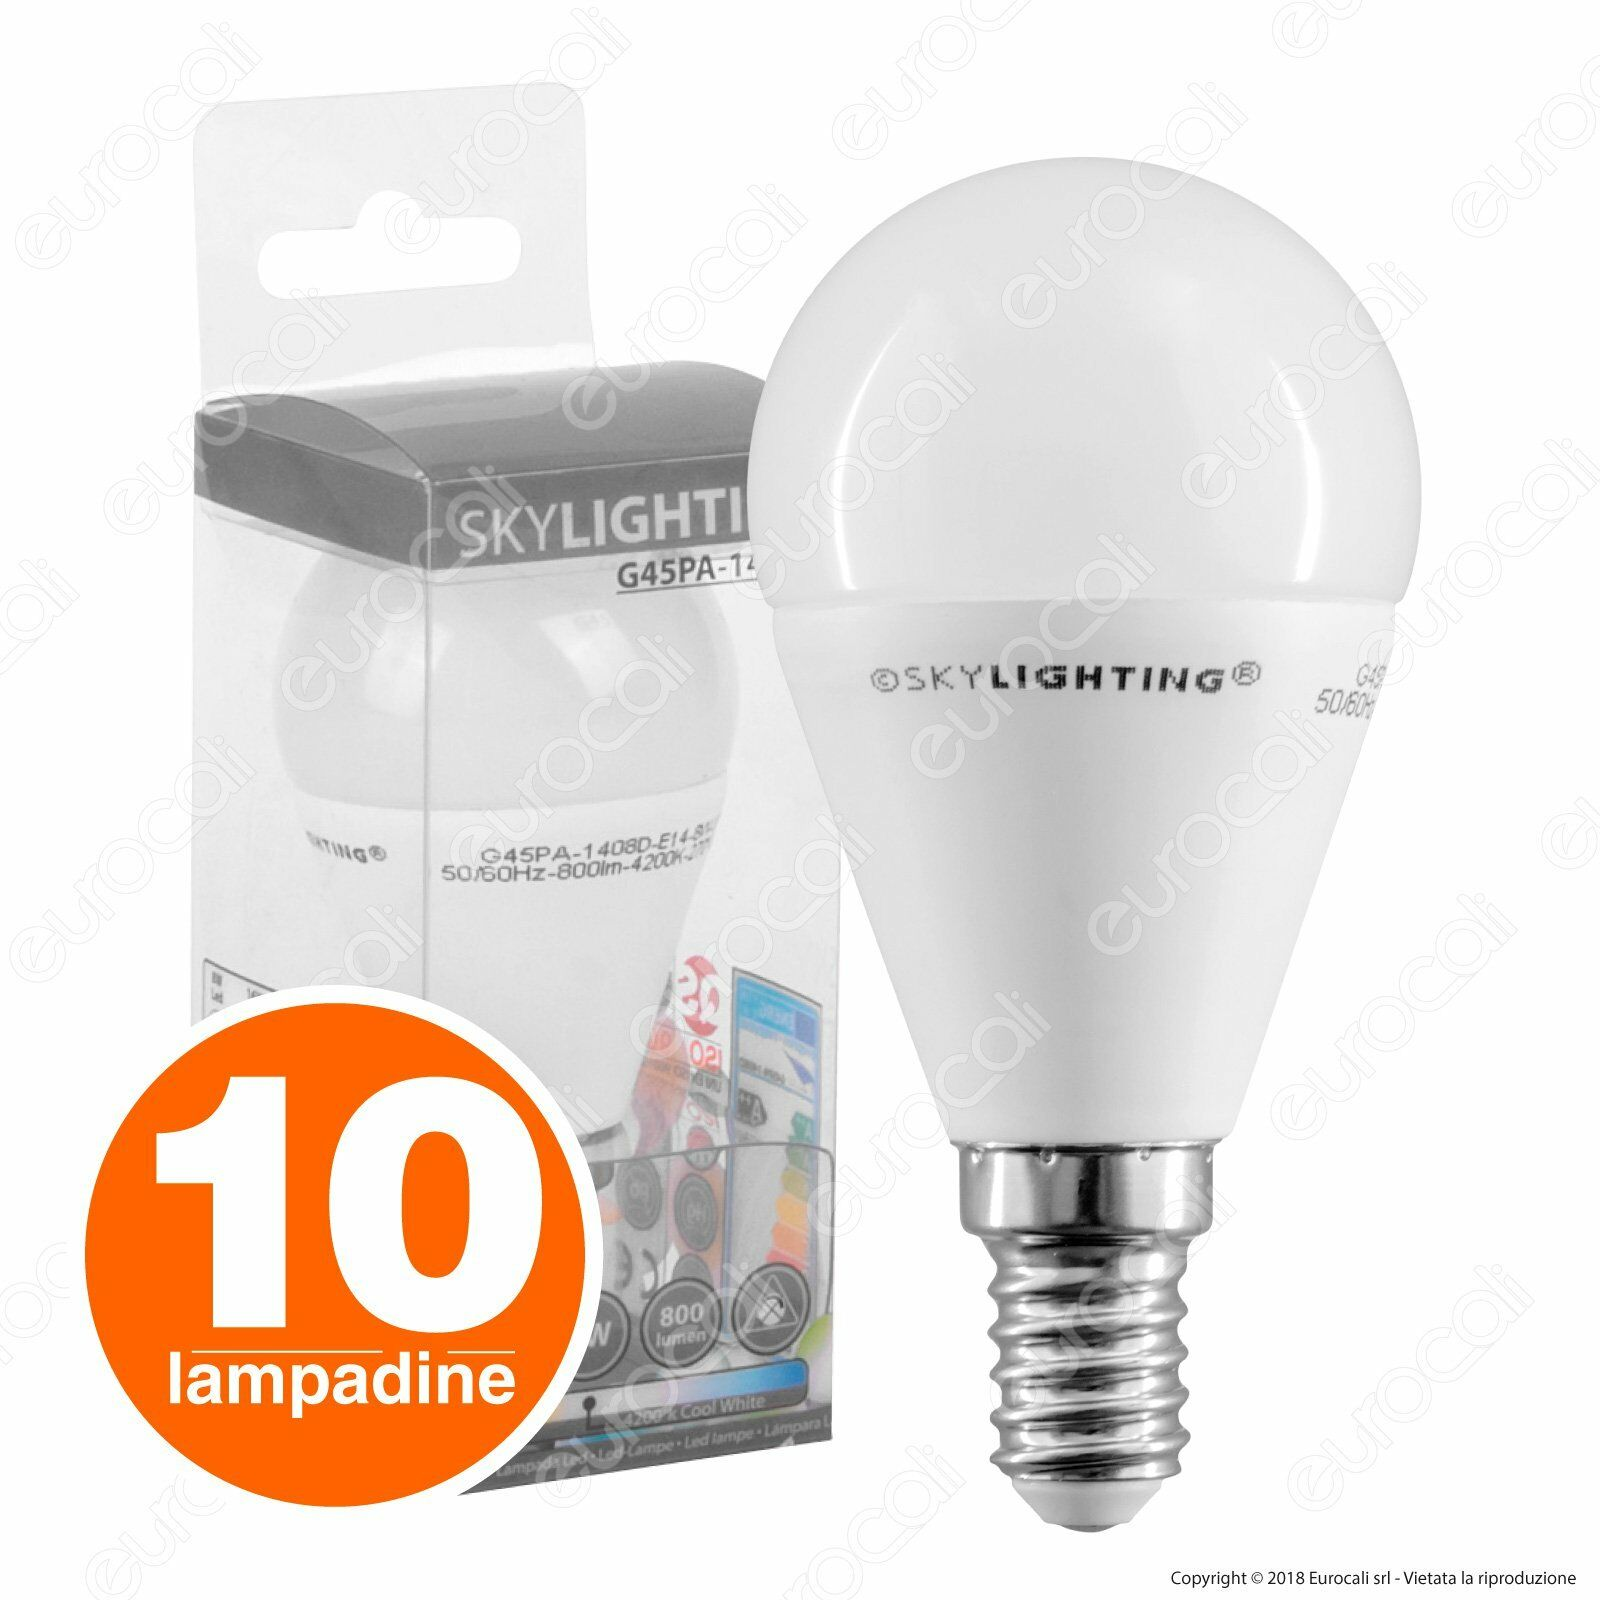 negozio online outlet 10 LAMPADINE LED SKYLIGHTING E14 MiniGlobo 8W Bulbo SMD SMD SMD 3000K 4200K 6400K  più sconto